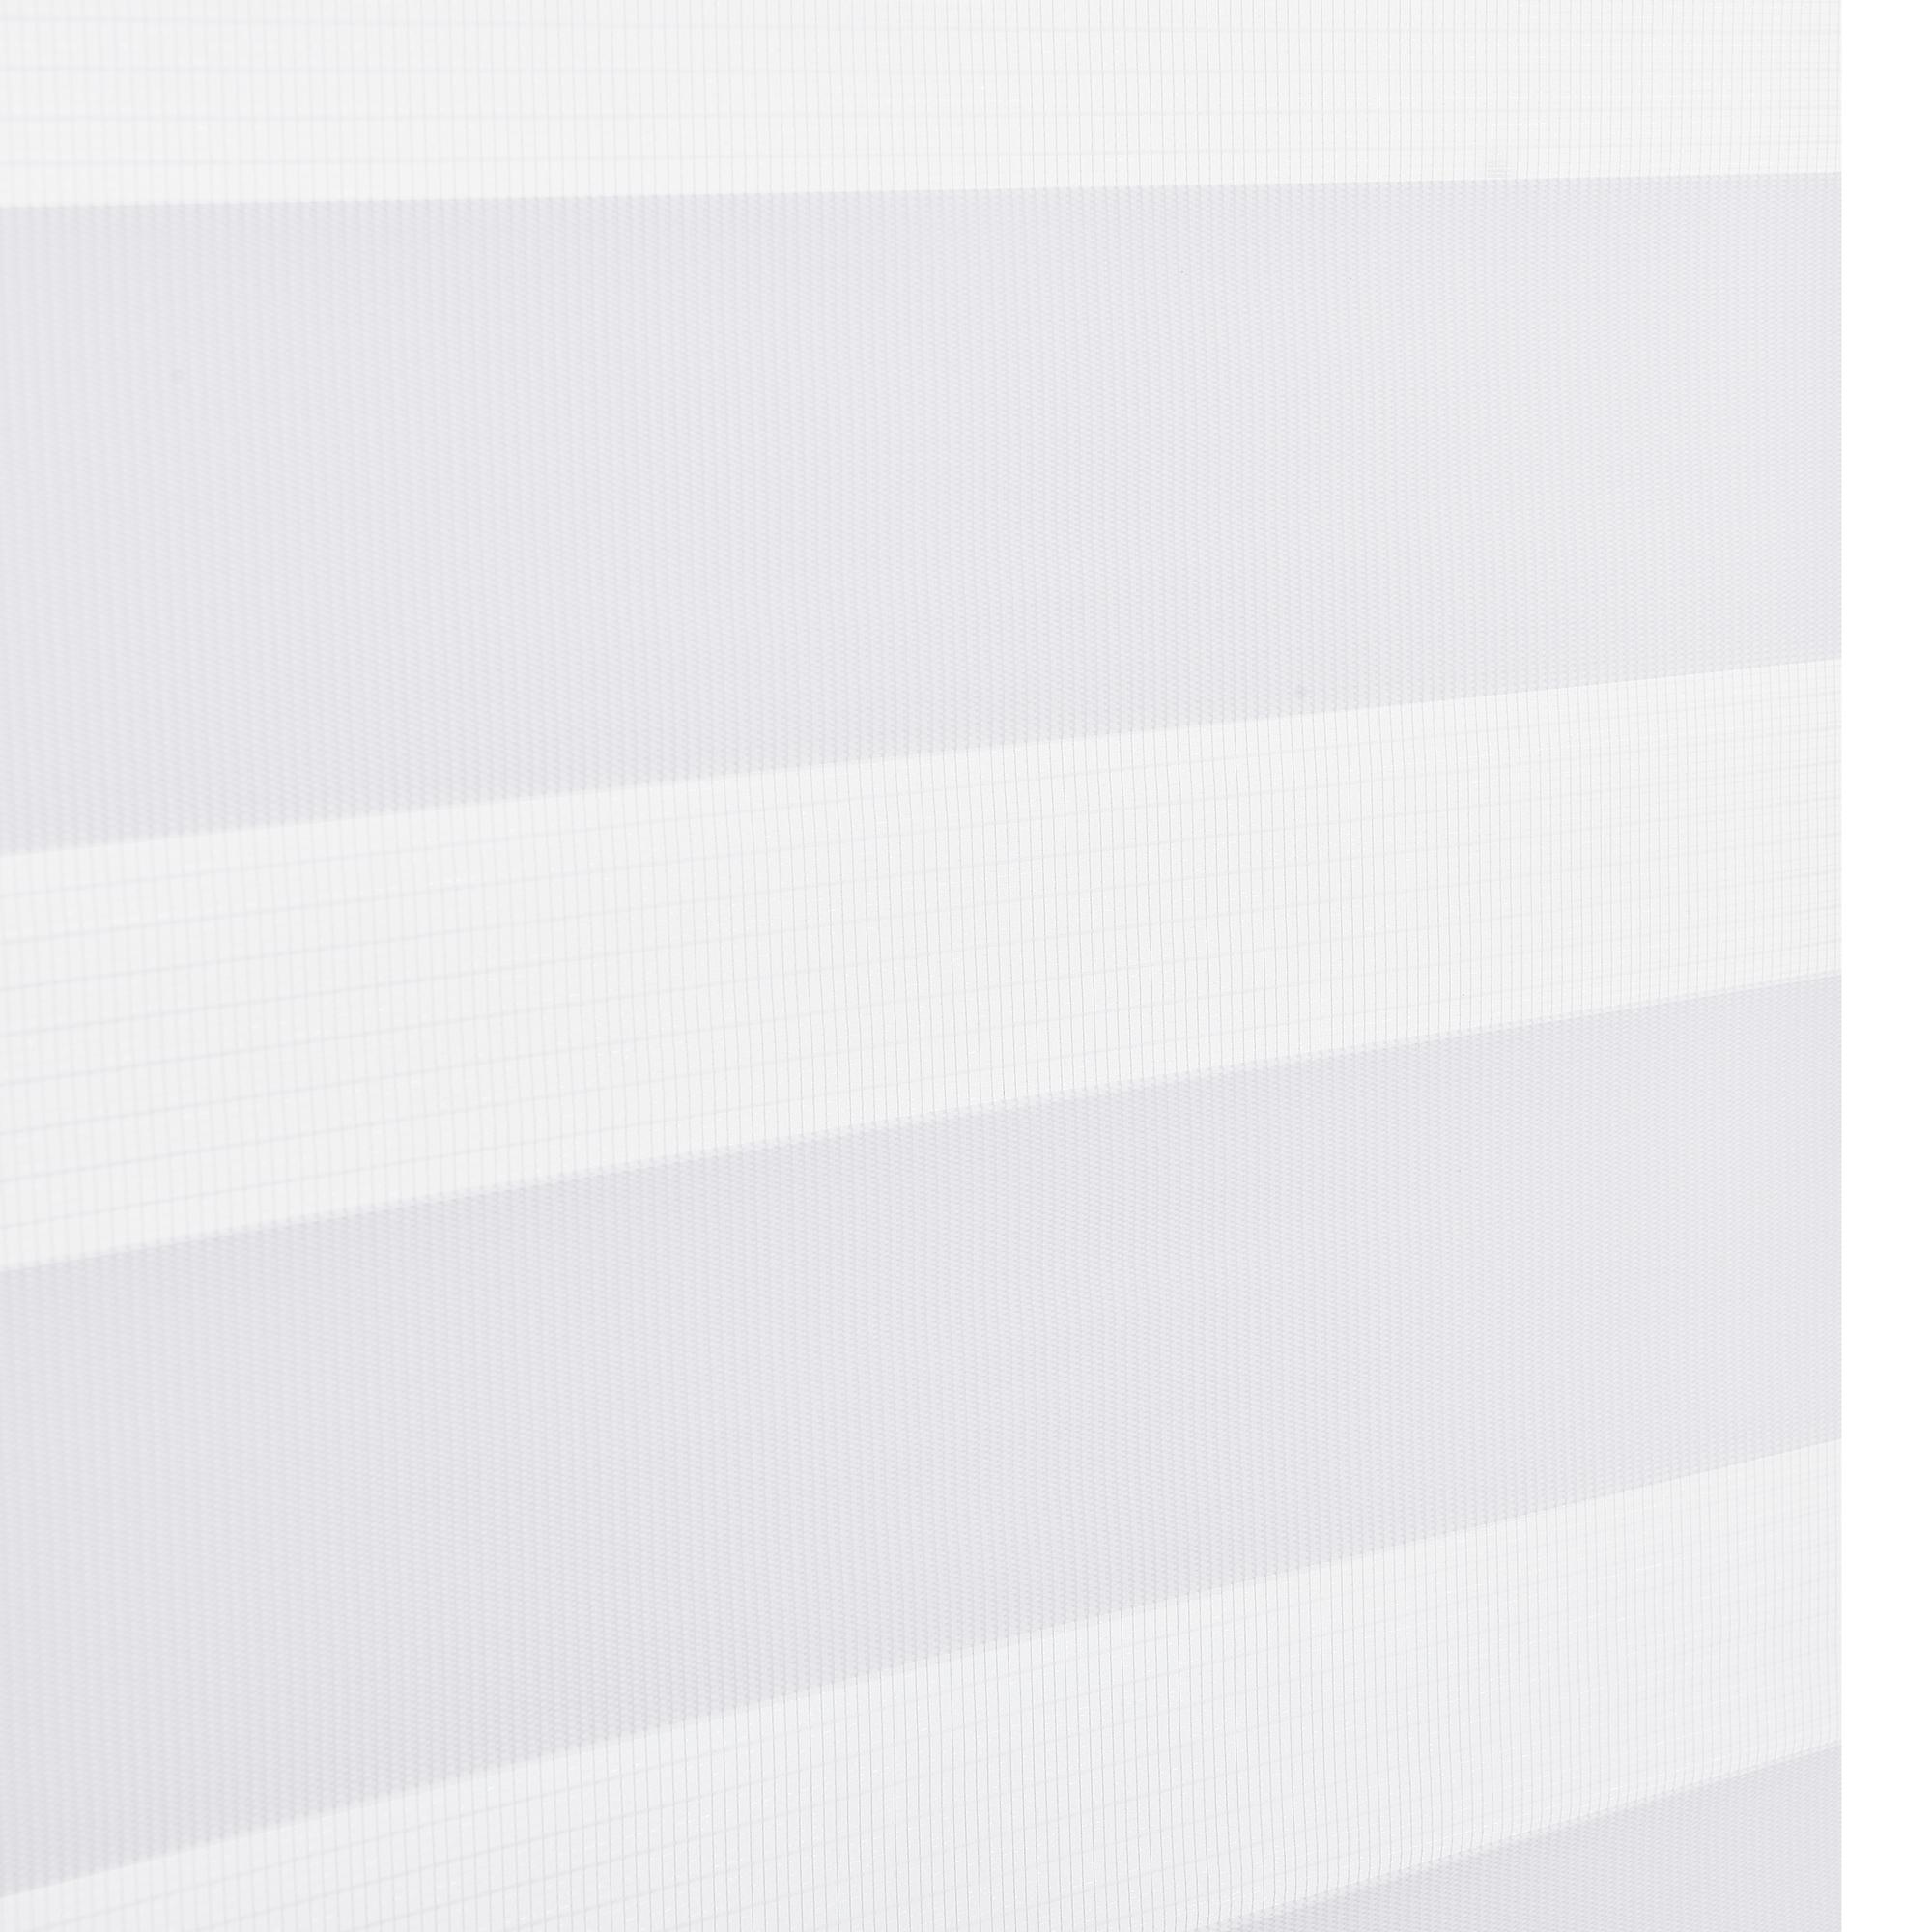 Duo Rollo 40x150cm Creme OHNE BOHREN Zebra Vario Jalousie Klemm Halter Easy Fix